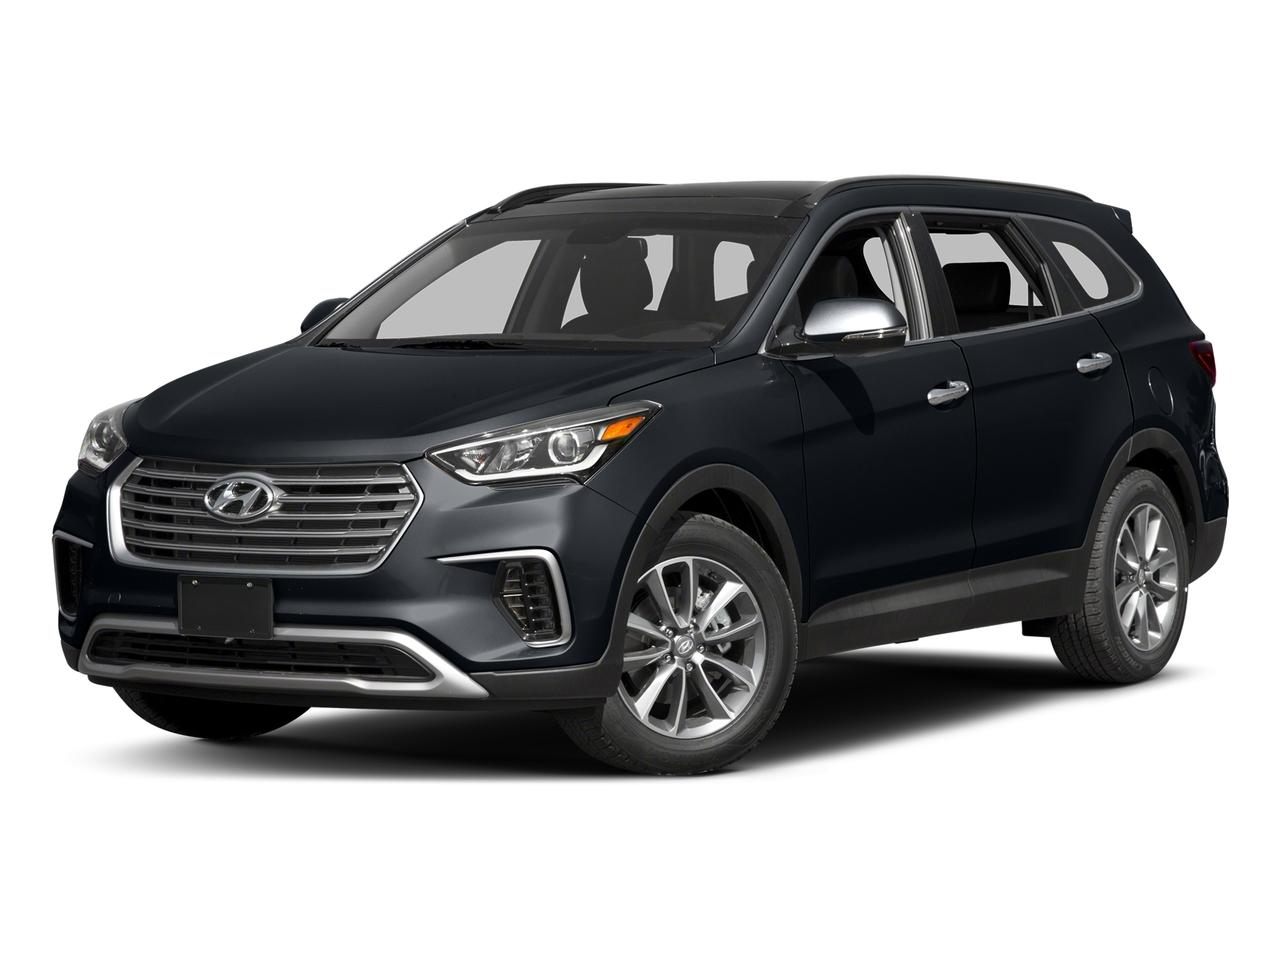 2017 Hyundai Santa Fe Vehicle Photo in BEND, OR 97701-5133